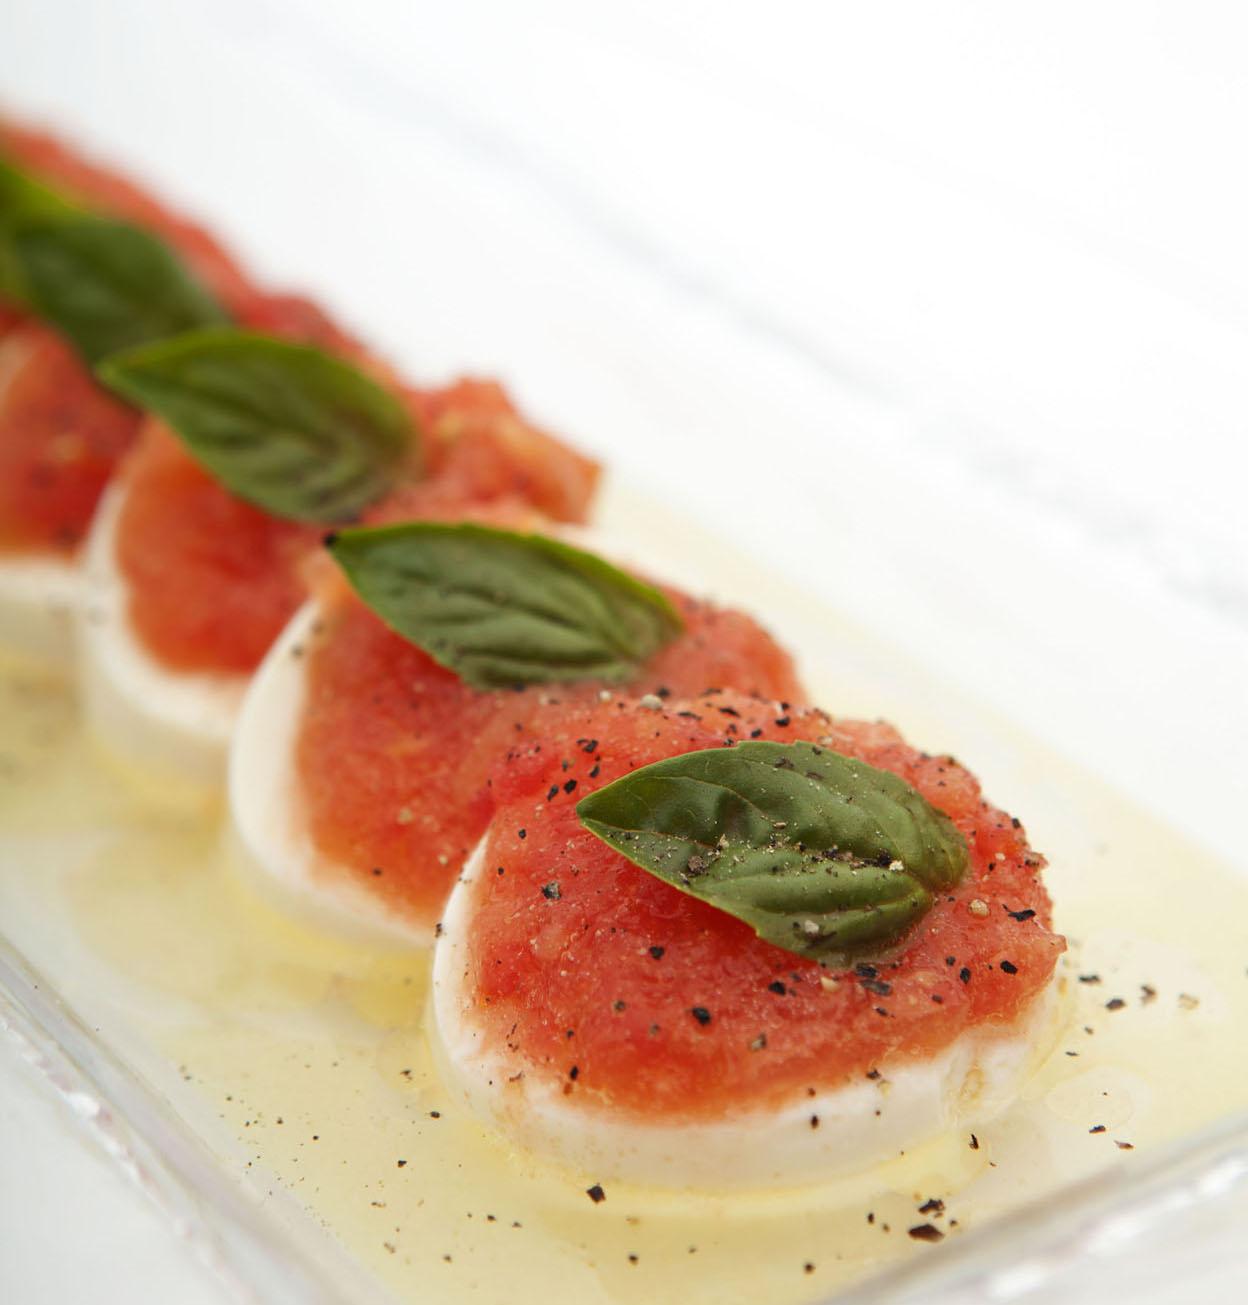 tofu-tomato-marinade-sydney-vegetarian-cookingclass-vegan-glutenfree-cookingschool-healthy